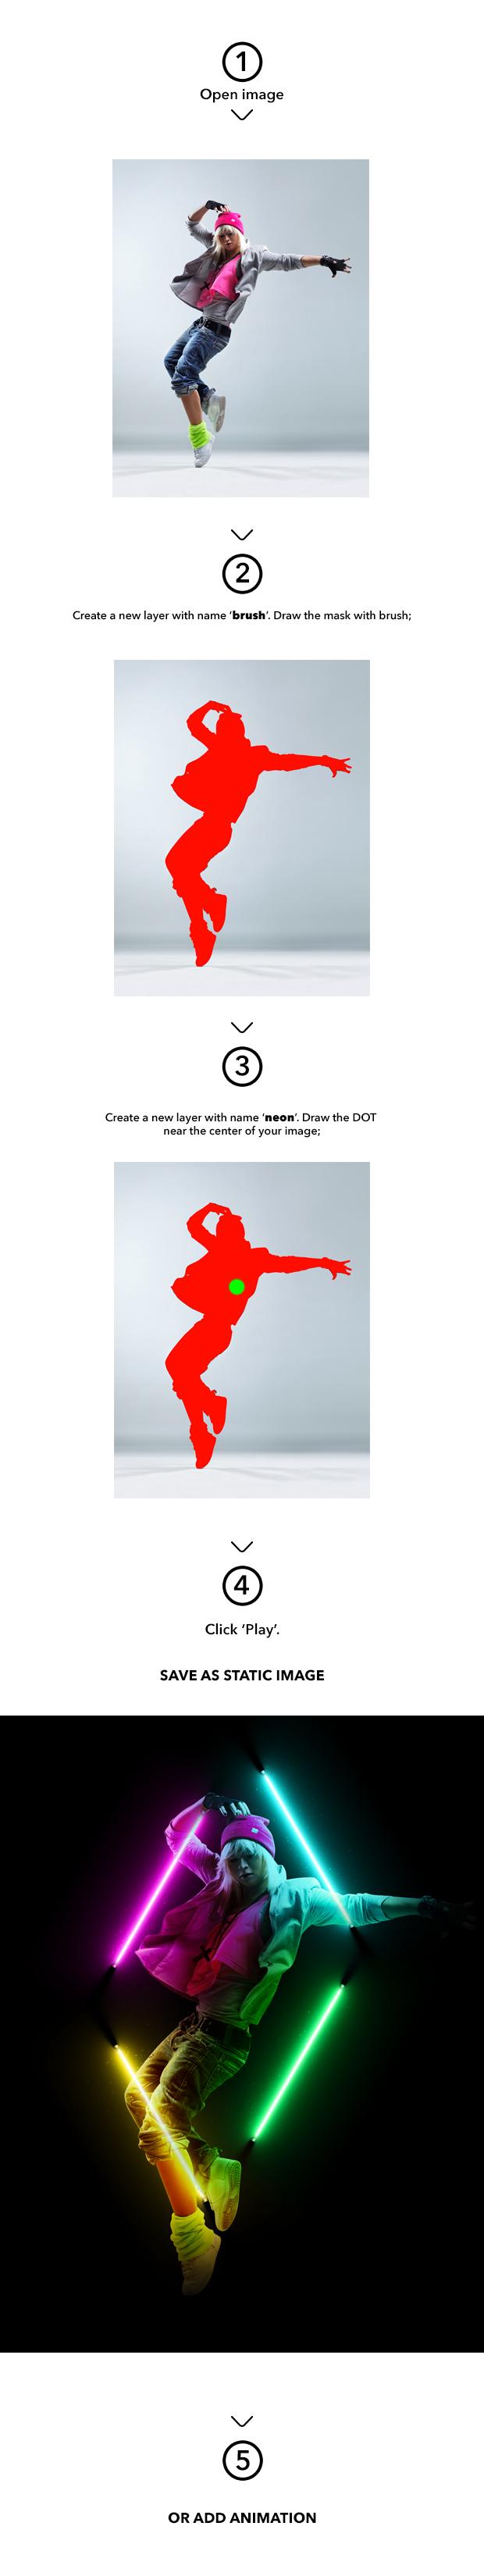 Gif Animated Neon Light Photoshop Action - 1